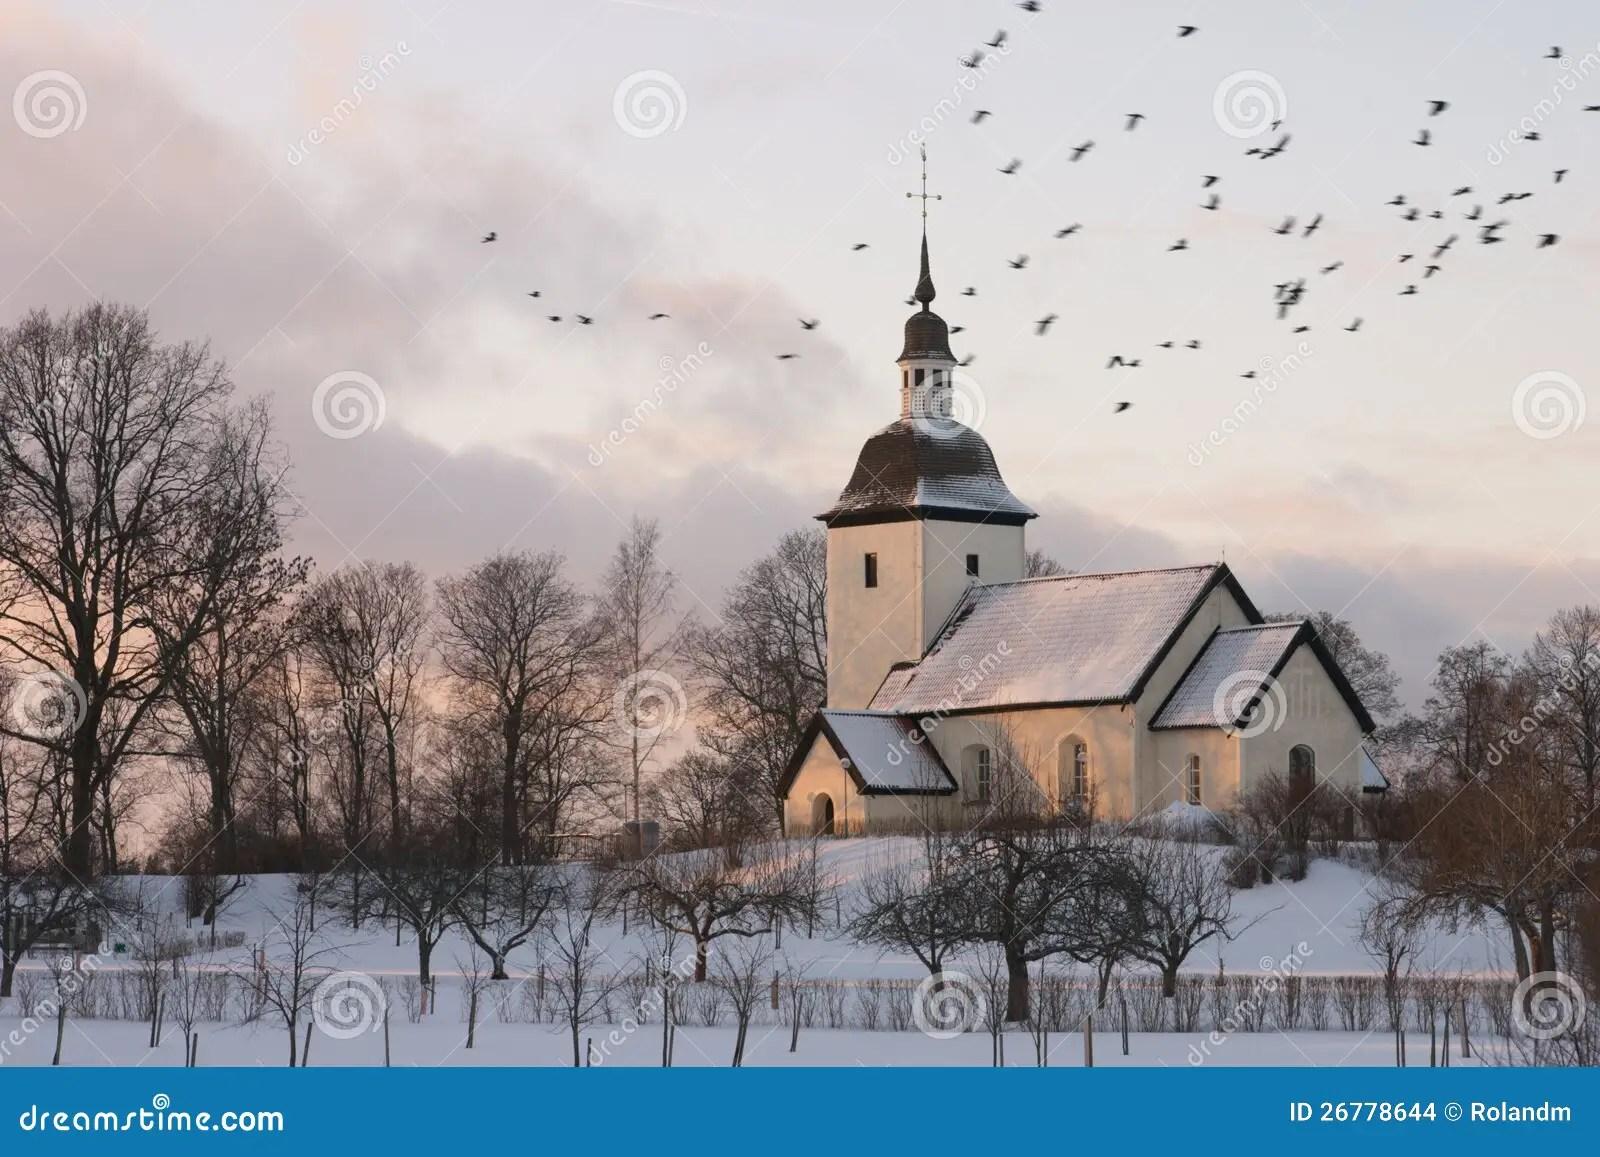 Free Falling Snow Wallpaper Download Swedish Church Winter Stock Photo Image Of Beautiful